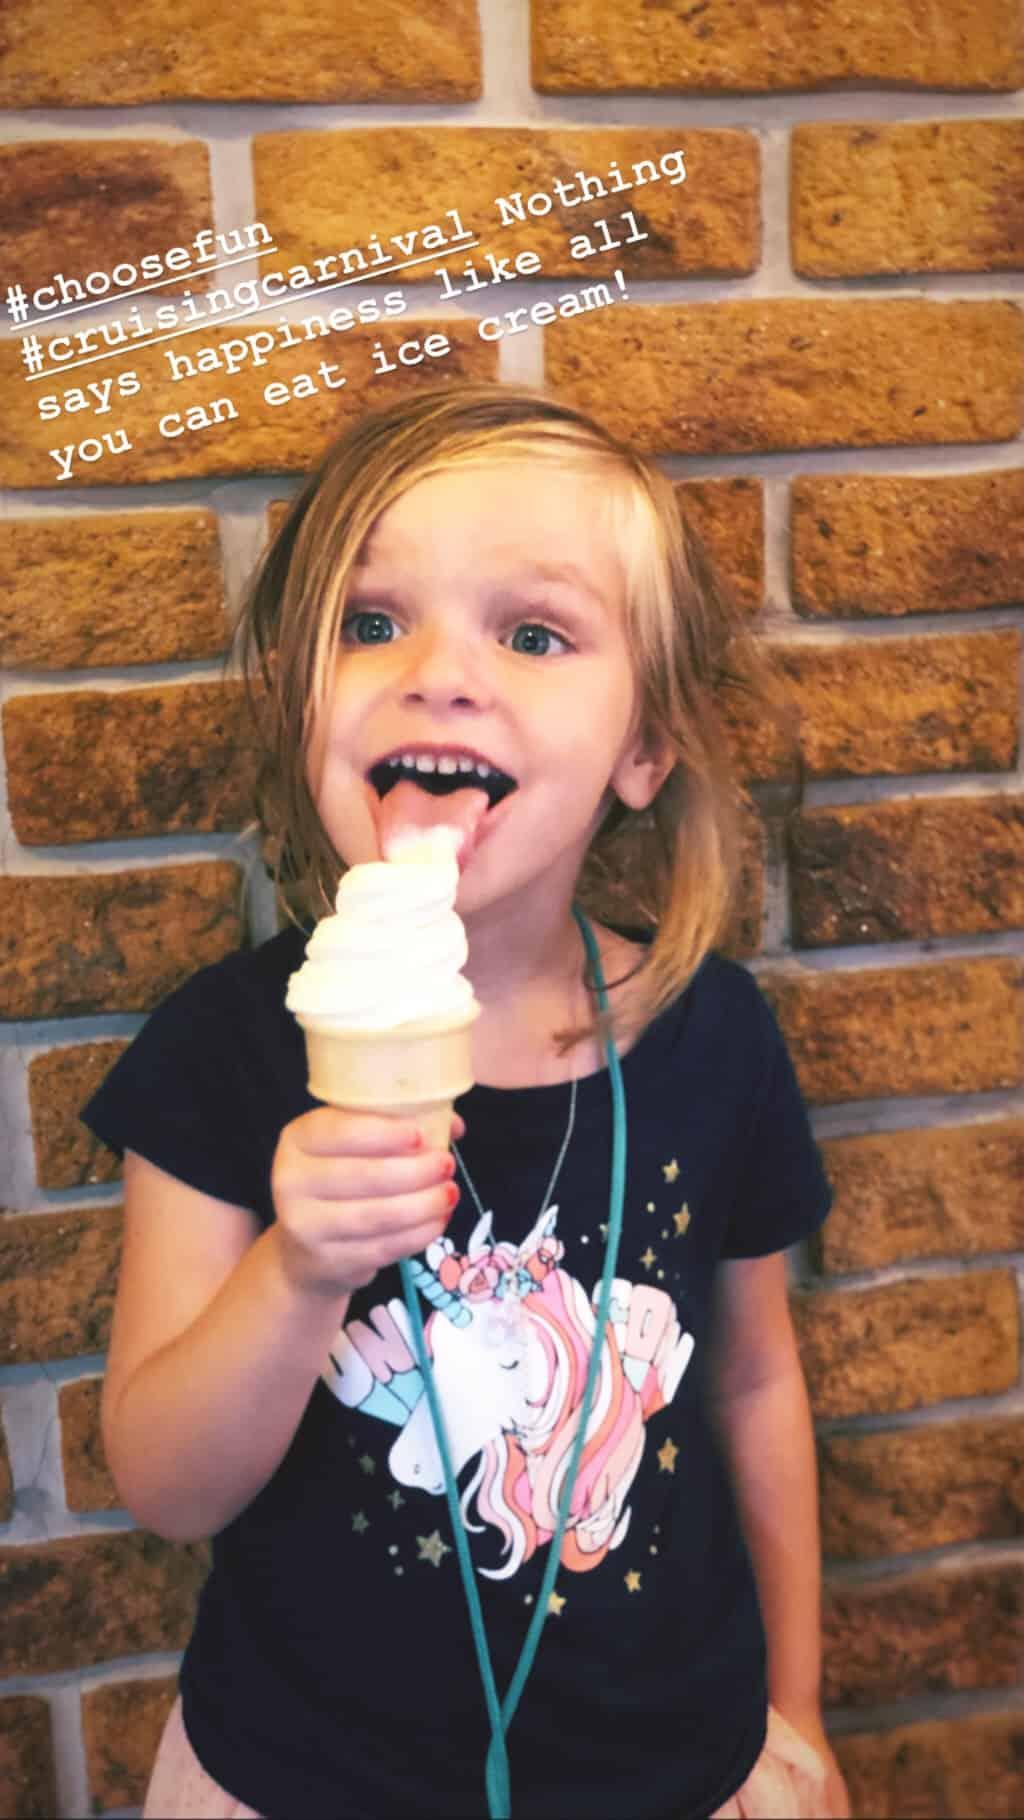 vanilla ice cream against brick wall